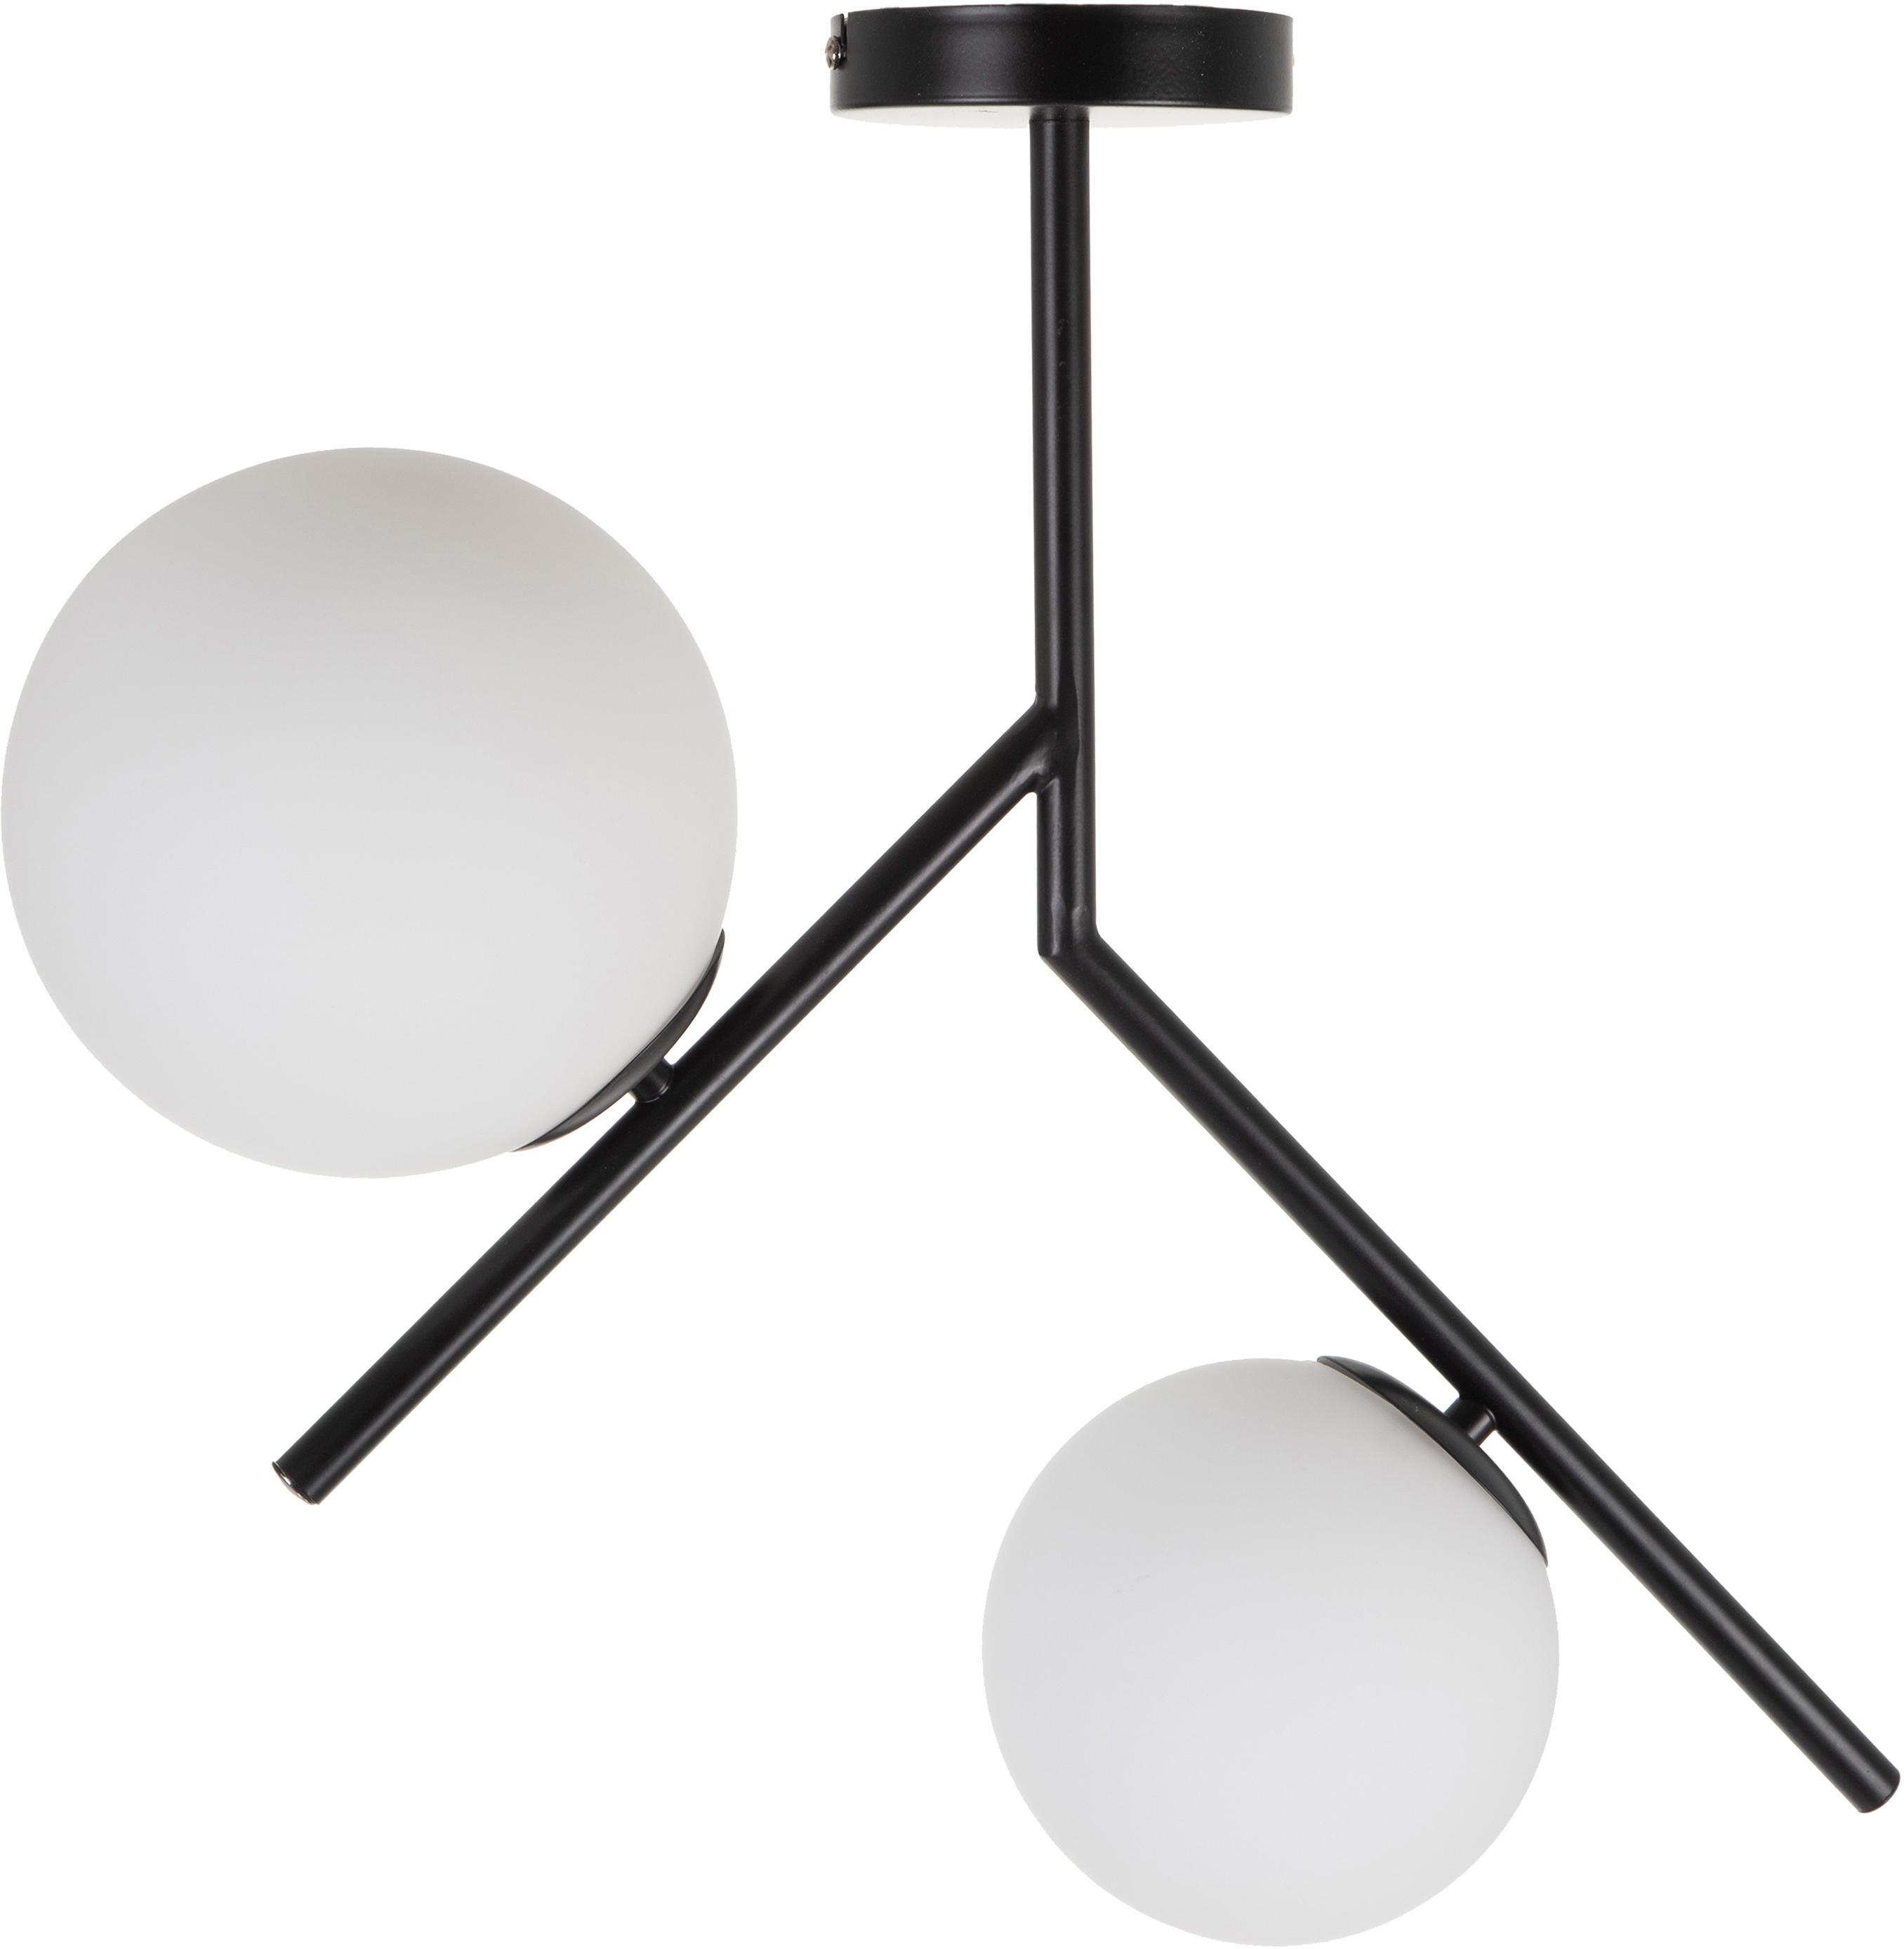 Plafondlamp Spheric, Metaal, glas, Zwart, wit, B 15 x D 58 cm